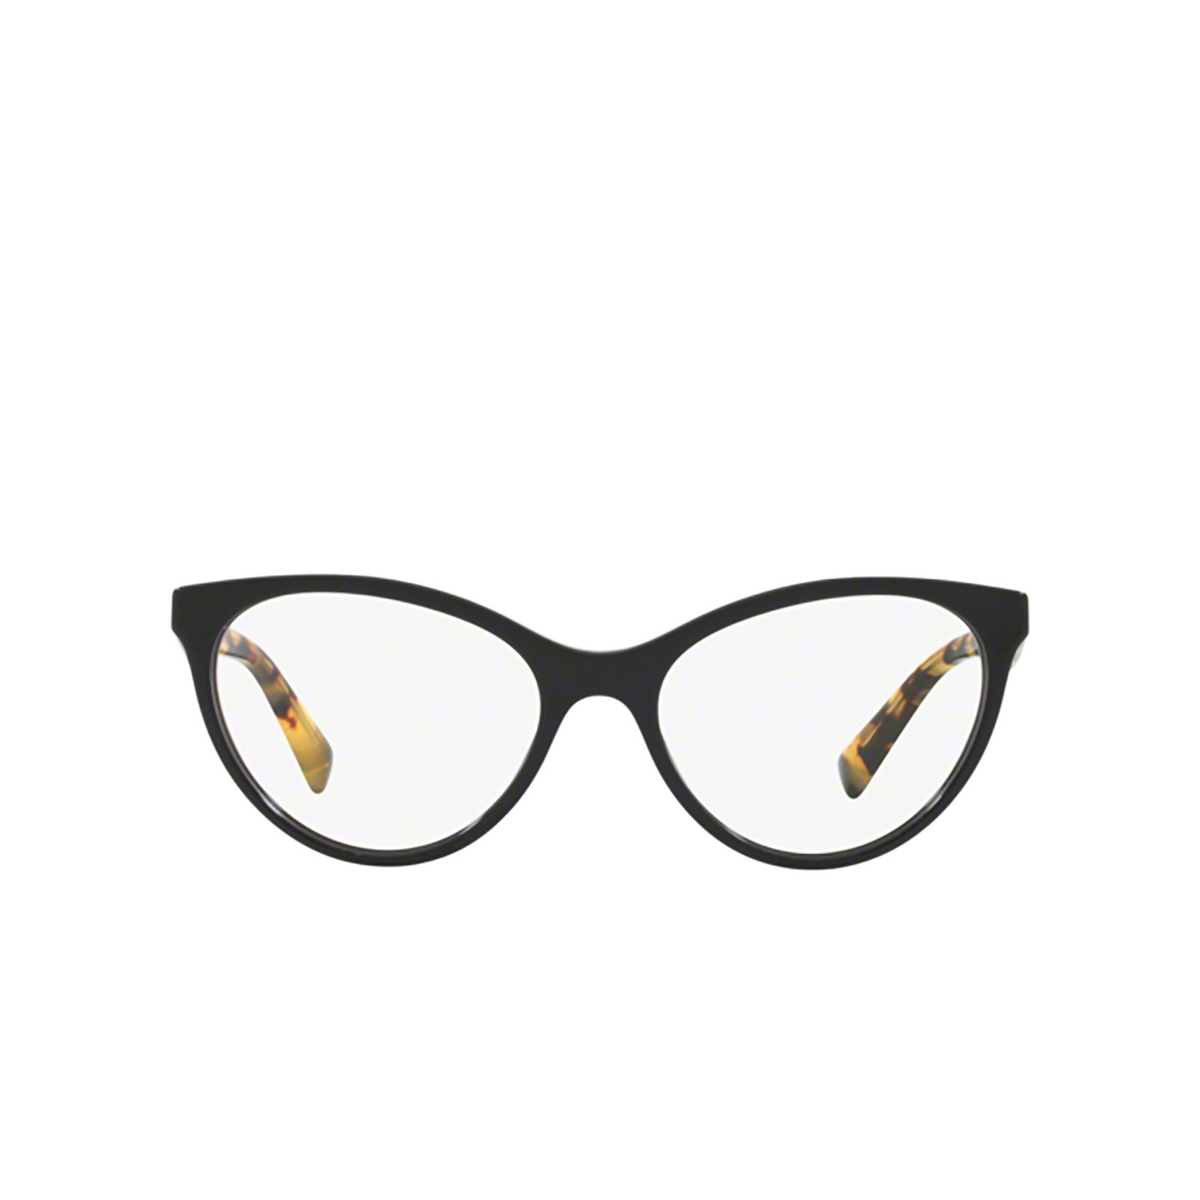 Valentino® Cat-eye Eyeglasses: VA3013 color Black 5001 - front view.